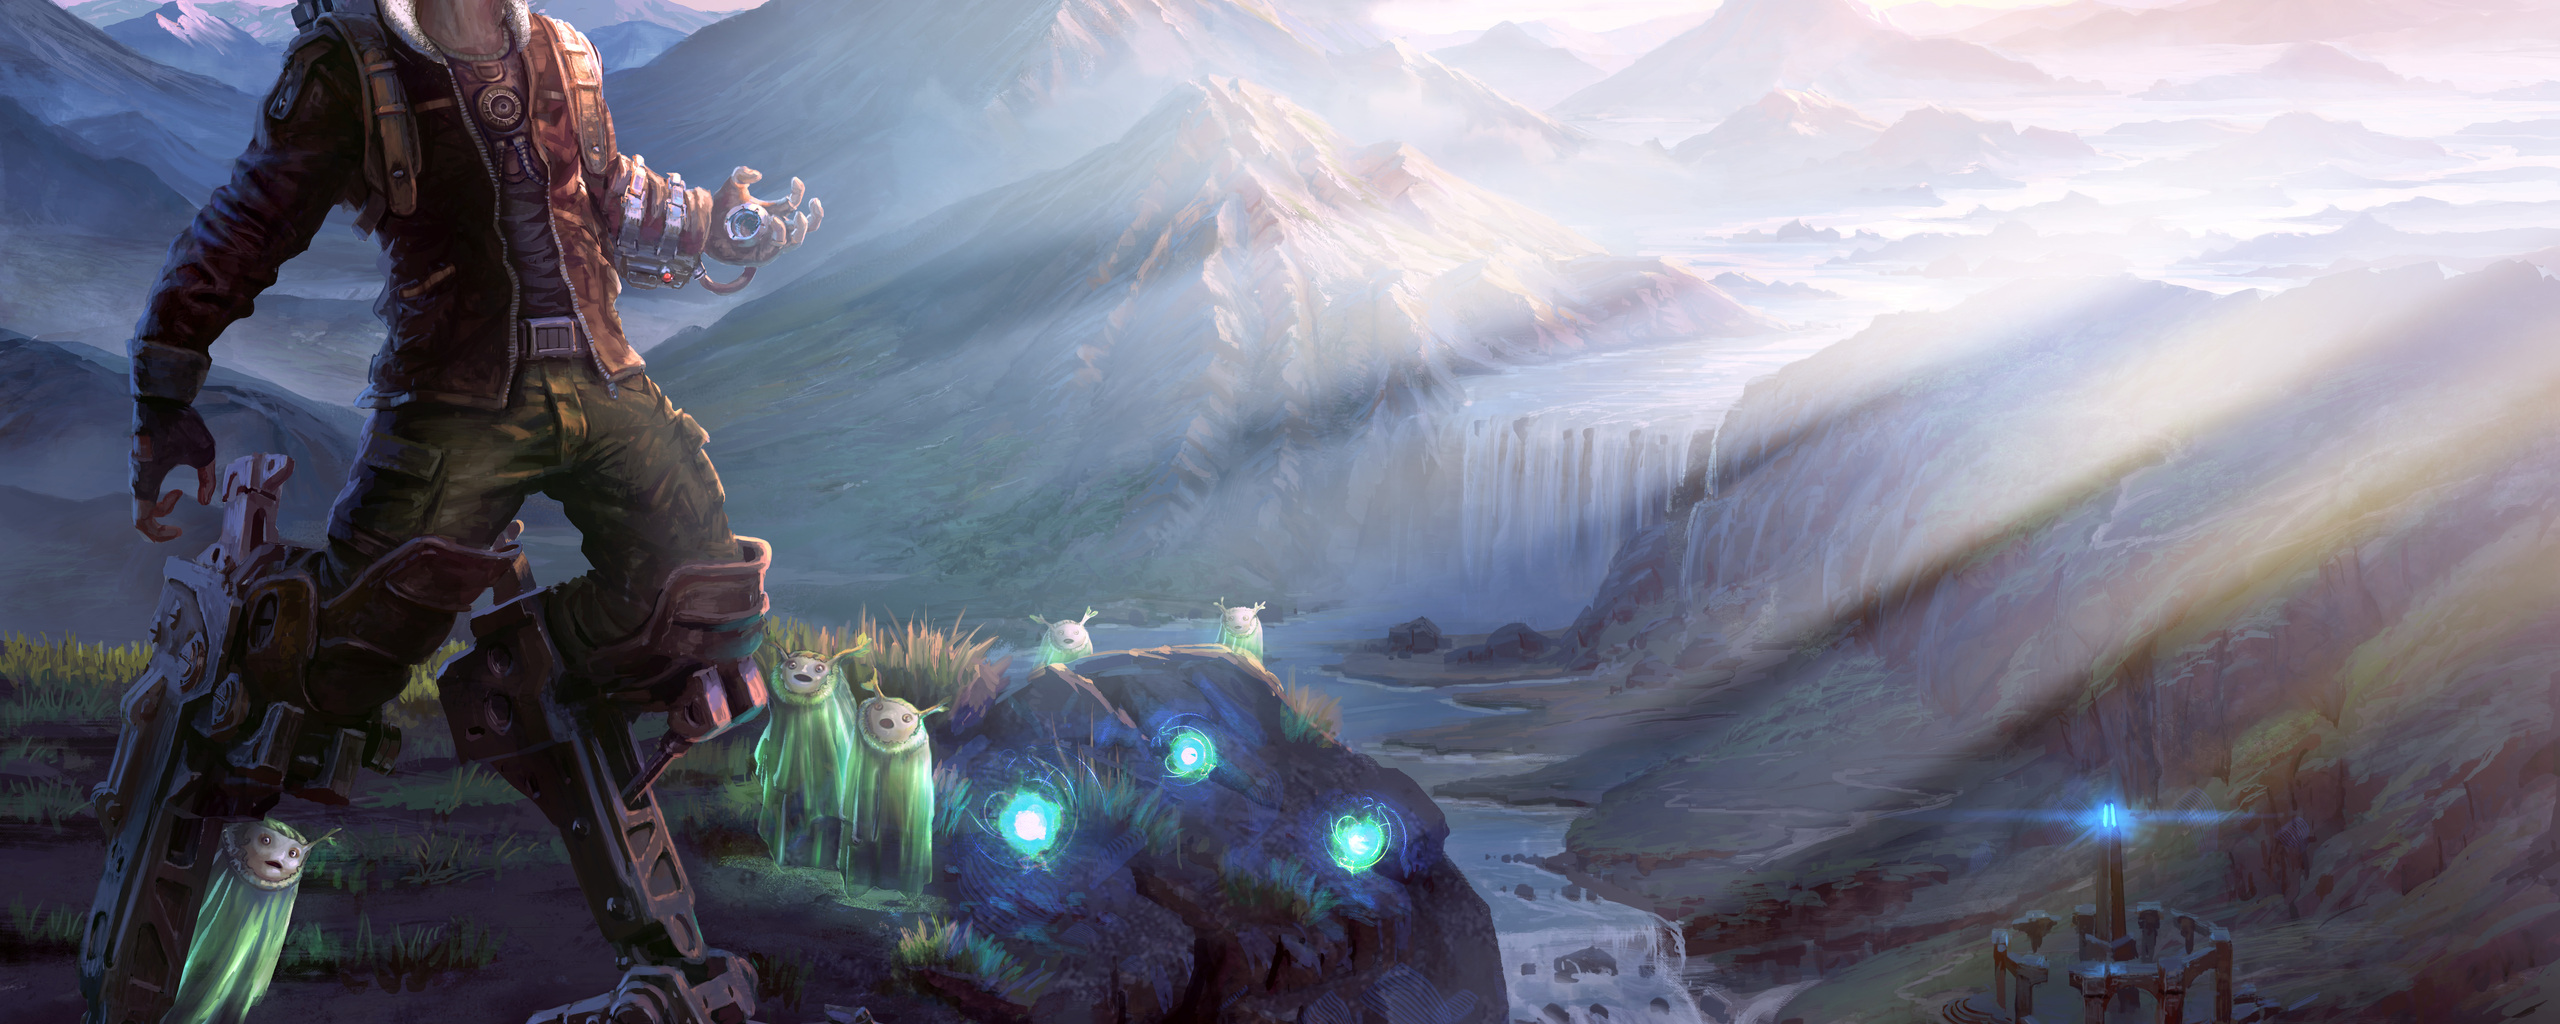 valley-video-game-5k-oz.jpg